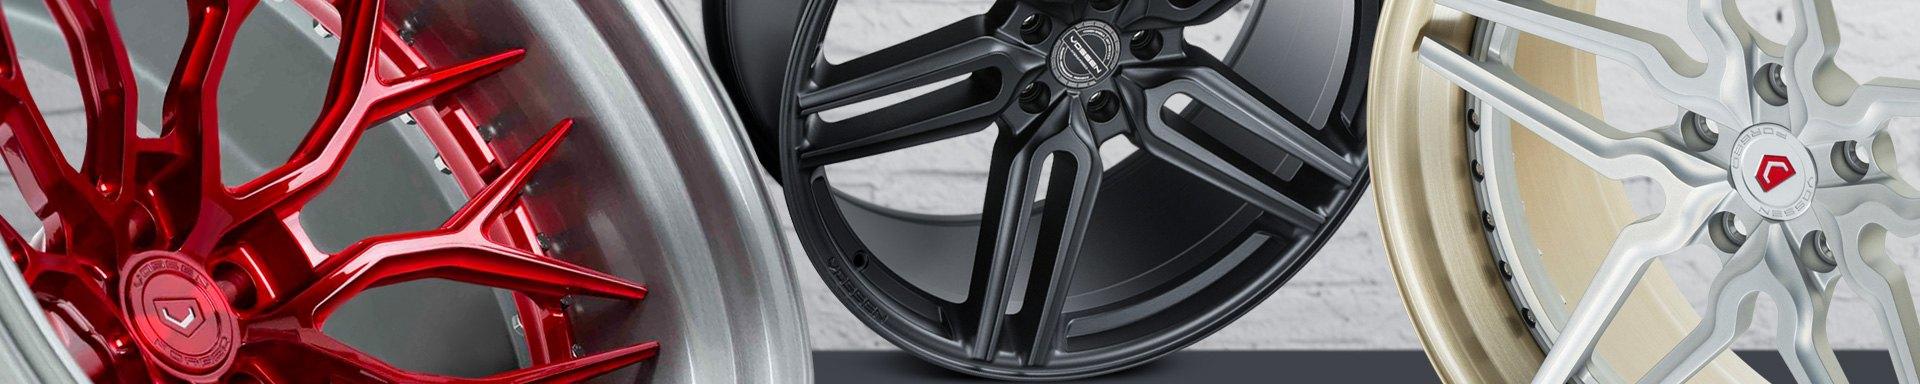 Vossen™ | Wheels & Rims from an Authorized Dealer - CARiD com